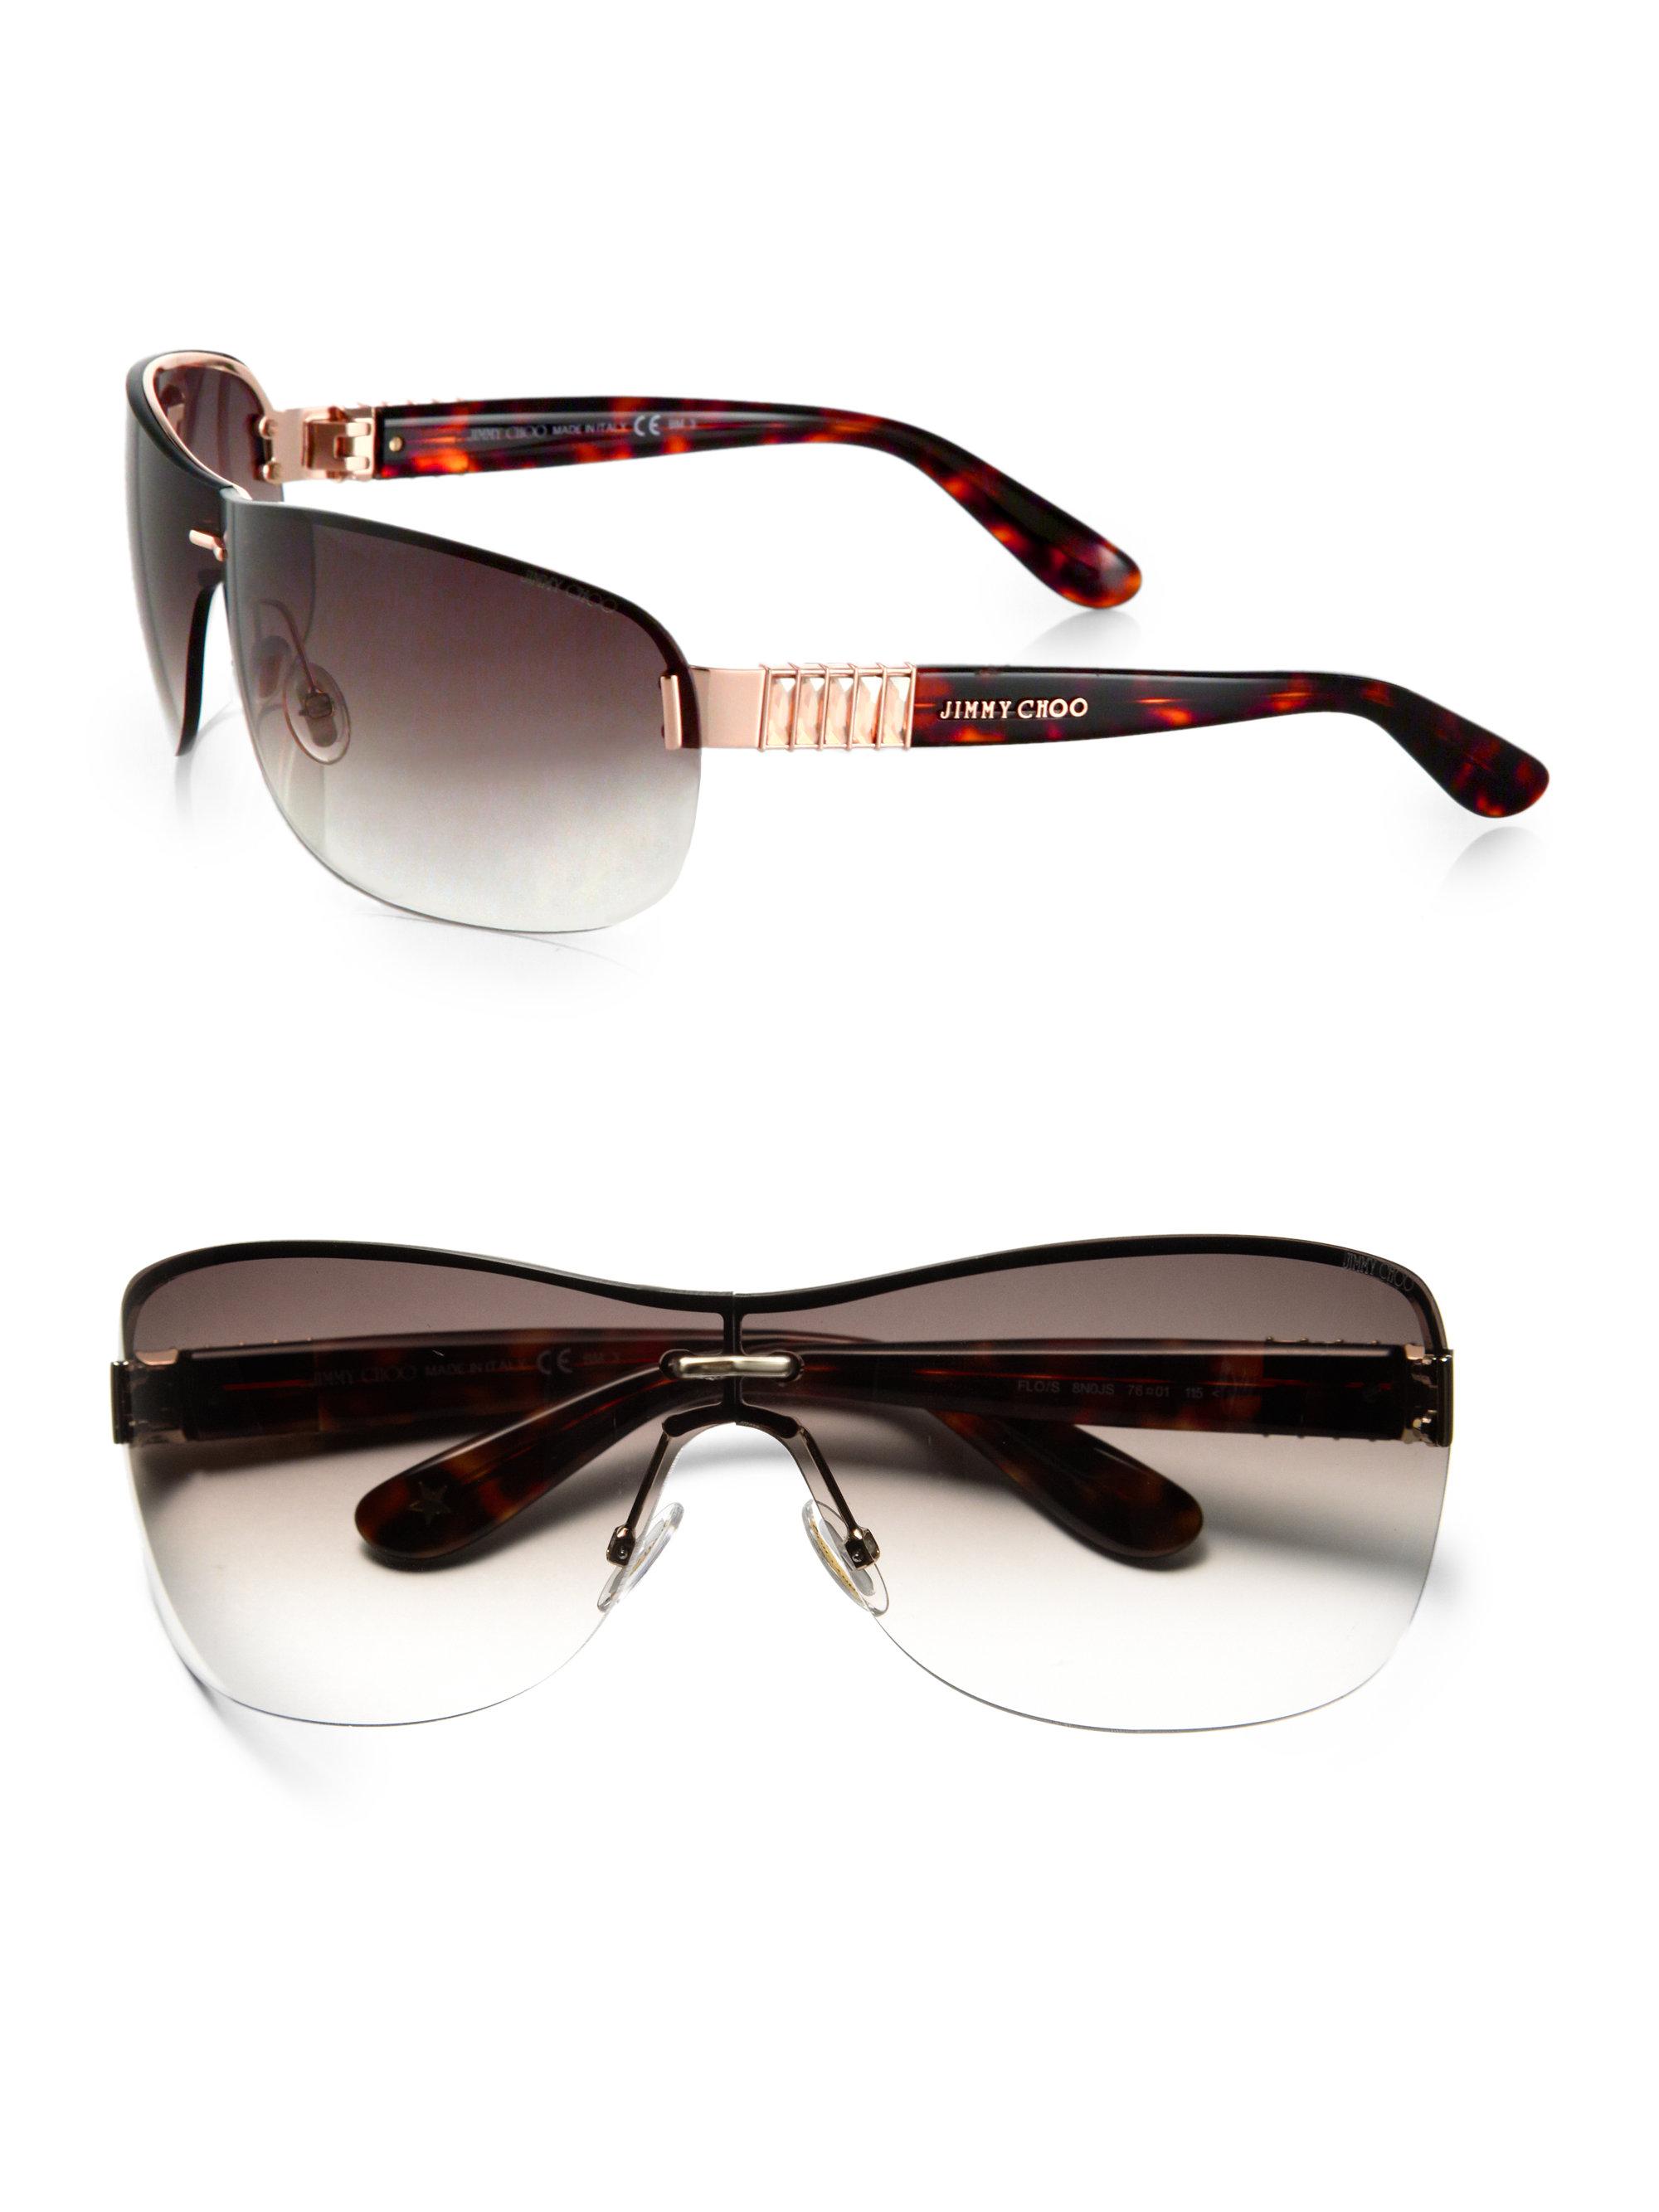 7b1602fad0 Lyst - Jimmy Choo Rimless Wrap Rectangular Shield Sunglasses in Brown